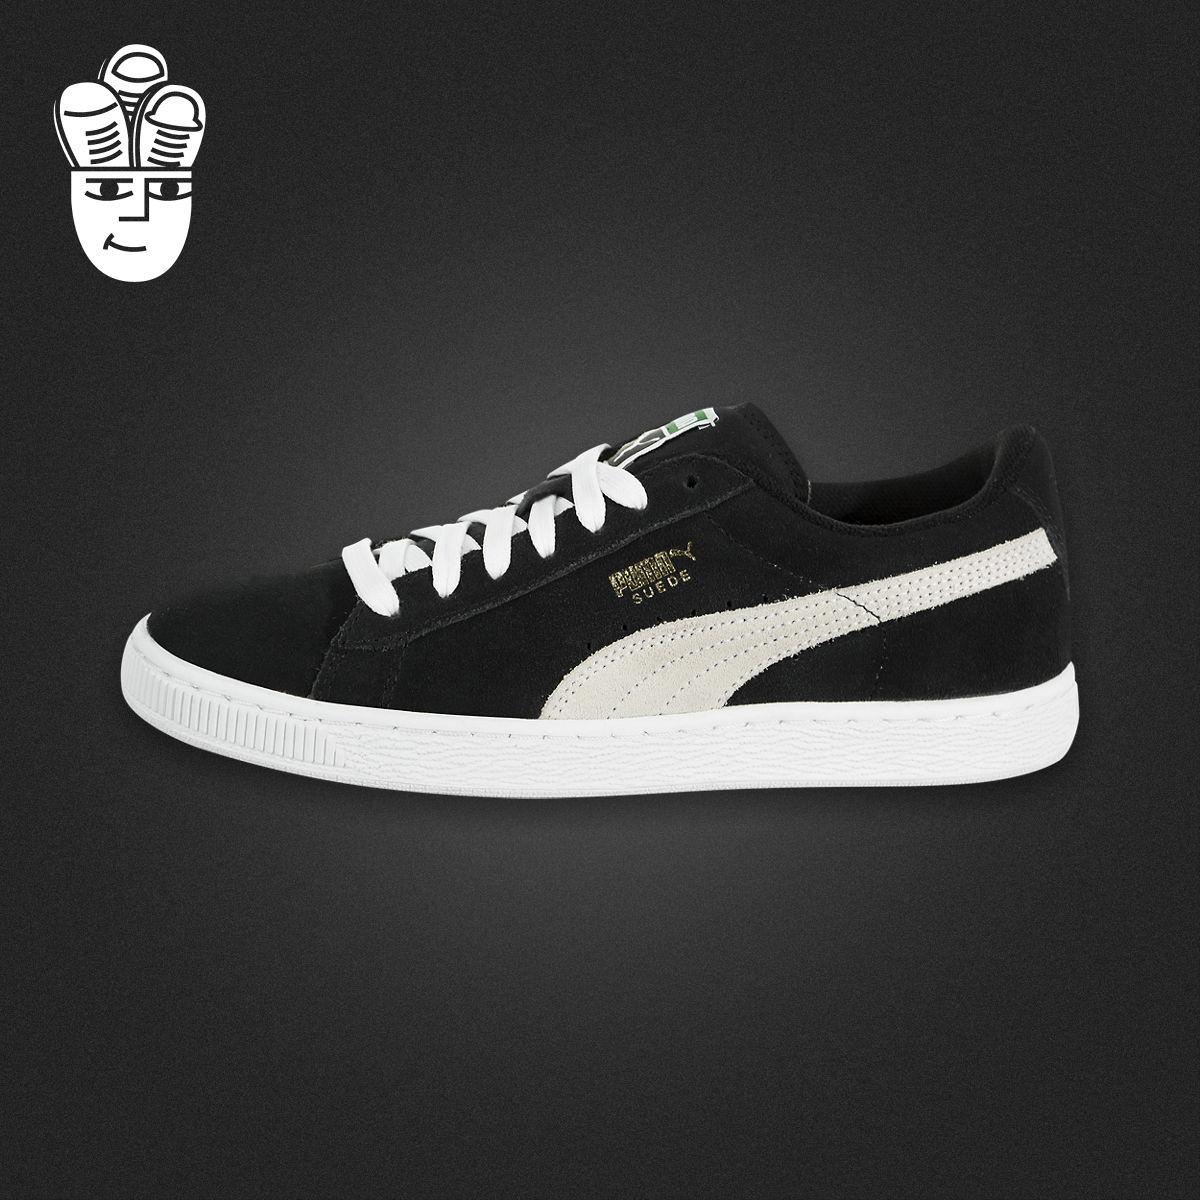 Puma Classic Suede 彪馬青少年休閒板鞋 經典復古童鞋 潮鞋